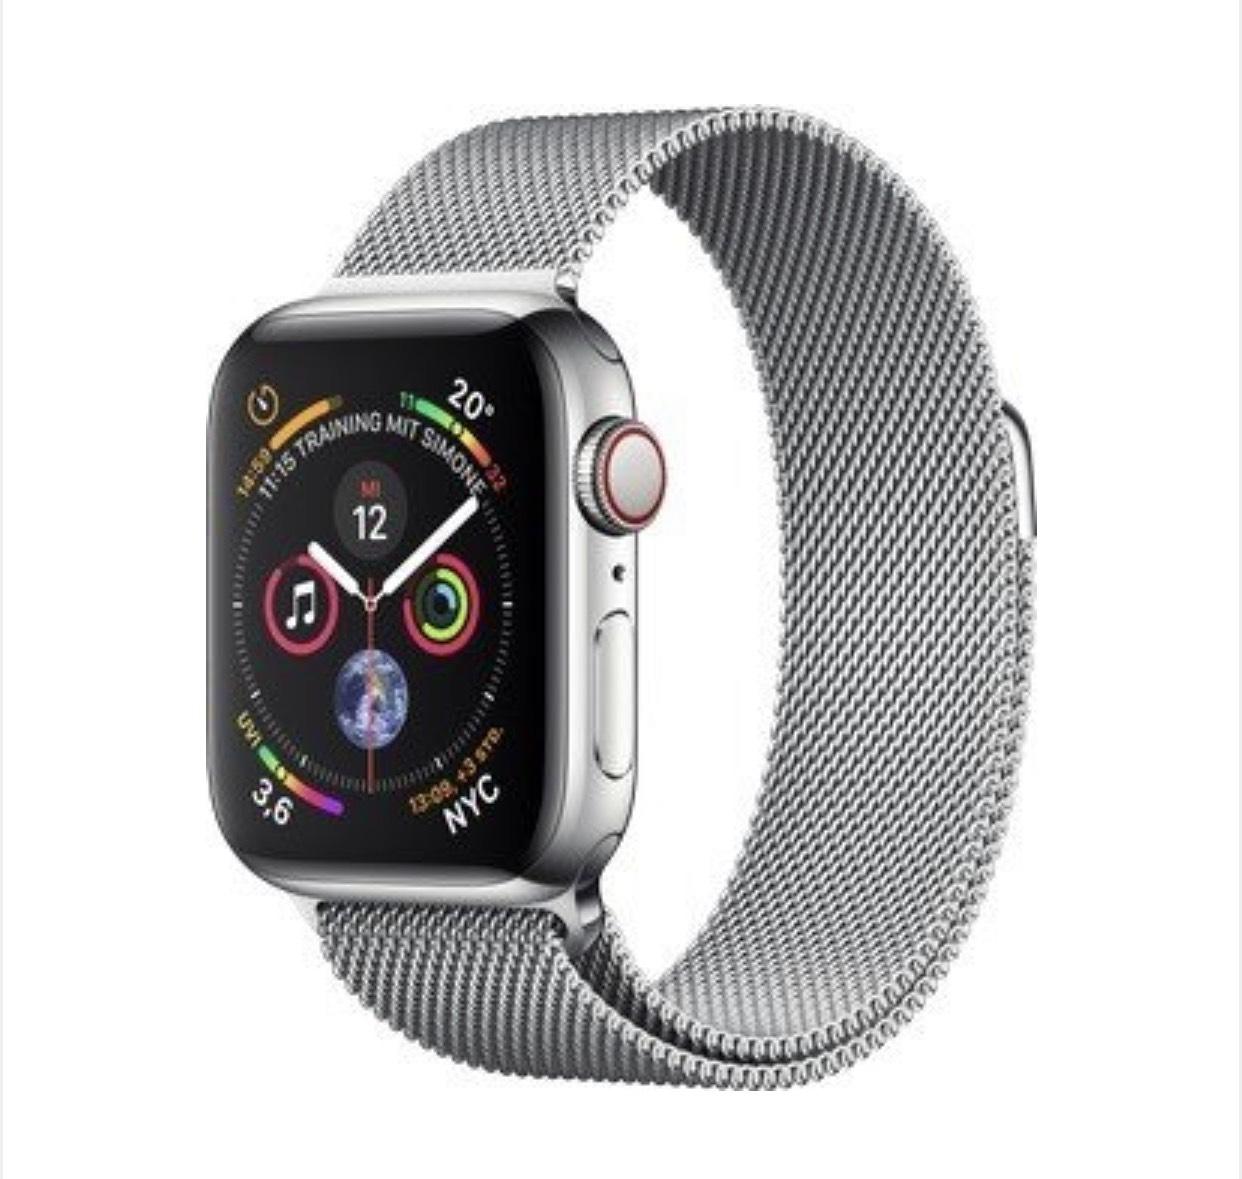 Apple Watch Series 4 (GPS + Cellular) Edelstahl 40mm silber mit Milanaise-Armband